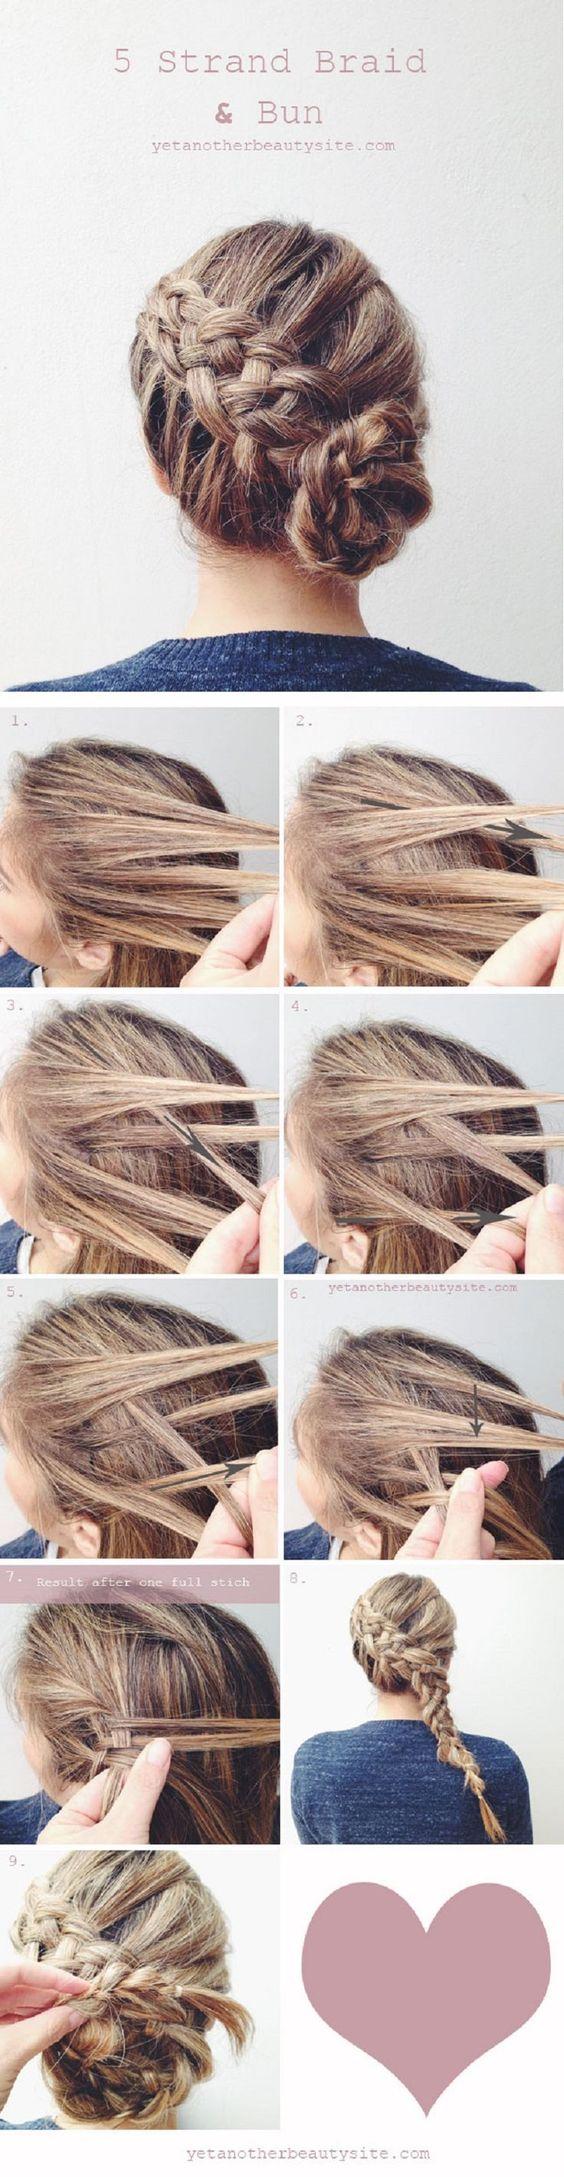 5 Strand Braid Bun - 16 Heatless DIY Hairstyles To Get You Through The Summer | GleamItUp